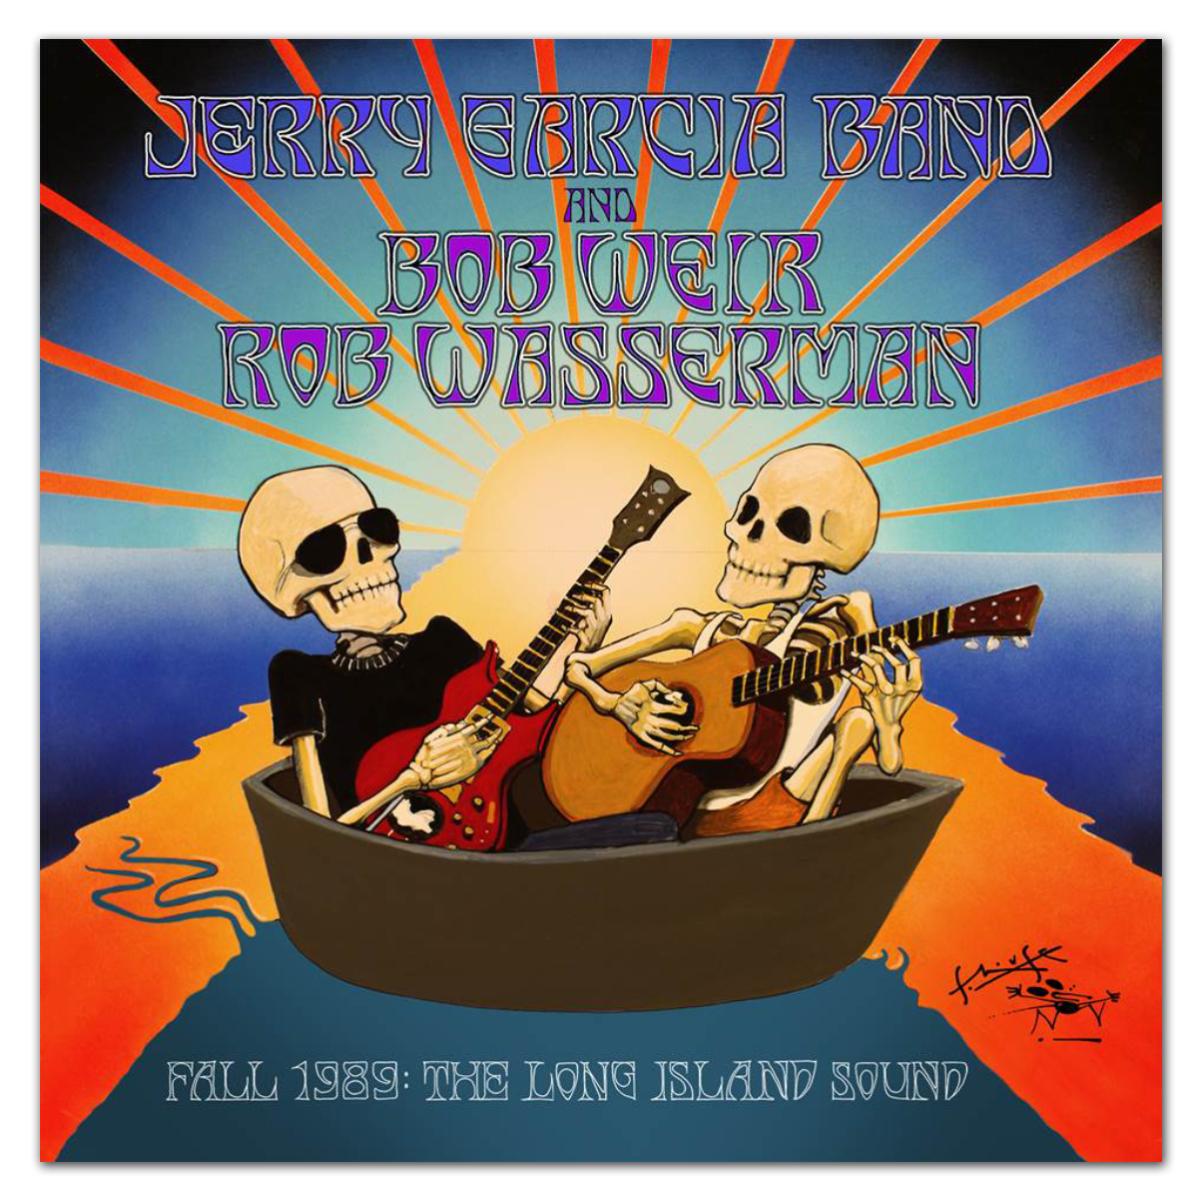 Fall 1989: The Long Island Sound 6-CD Box Set